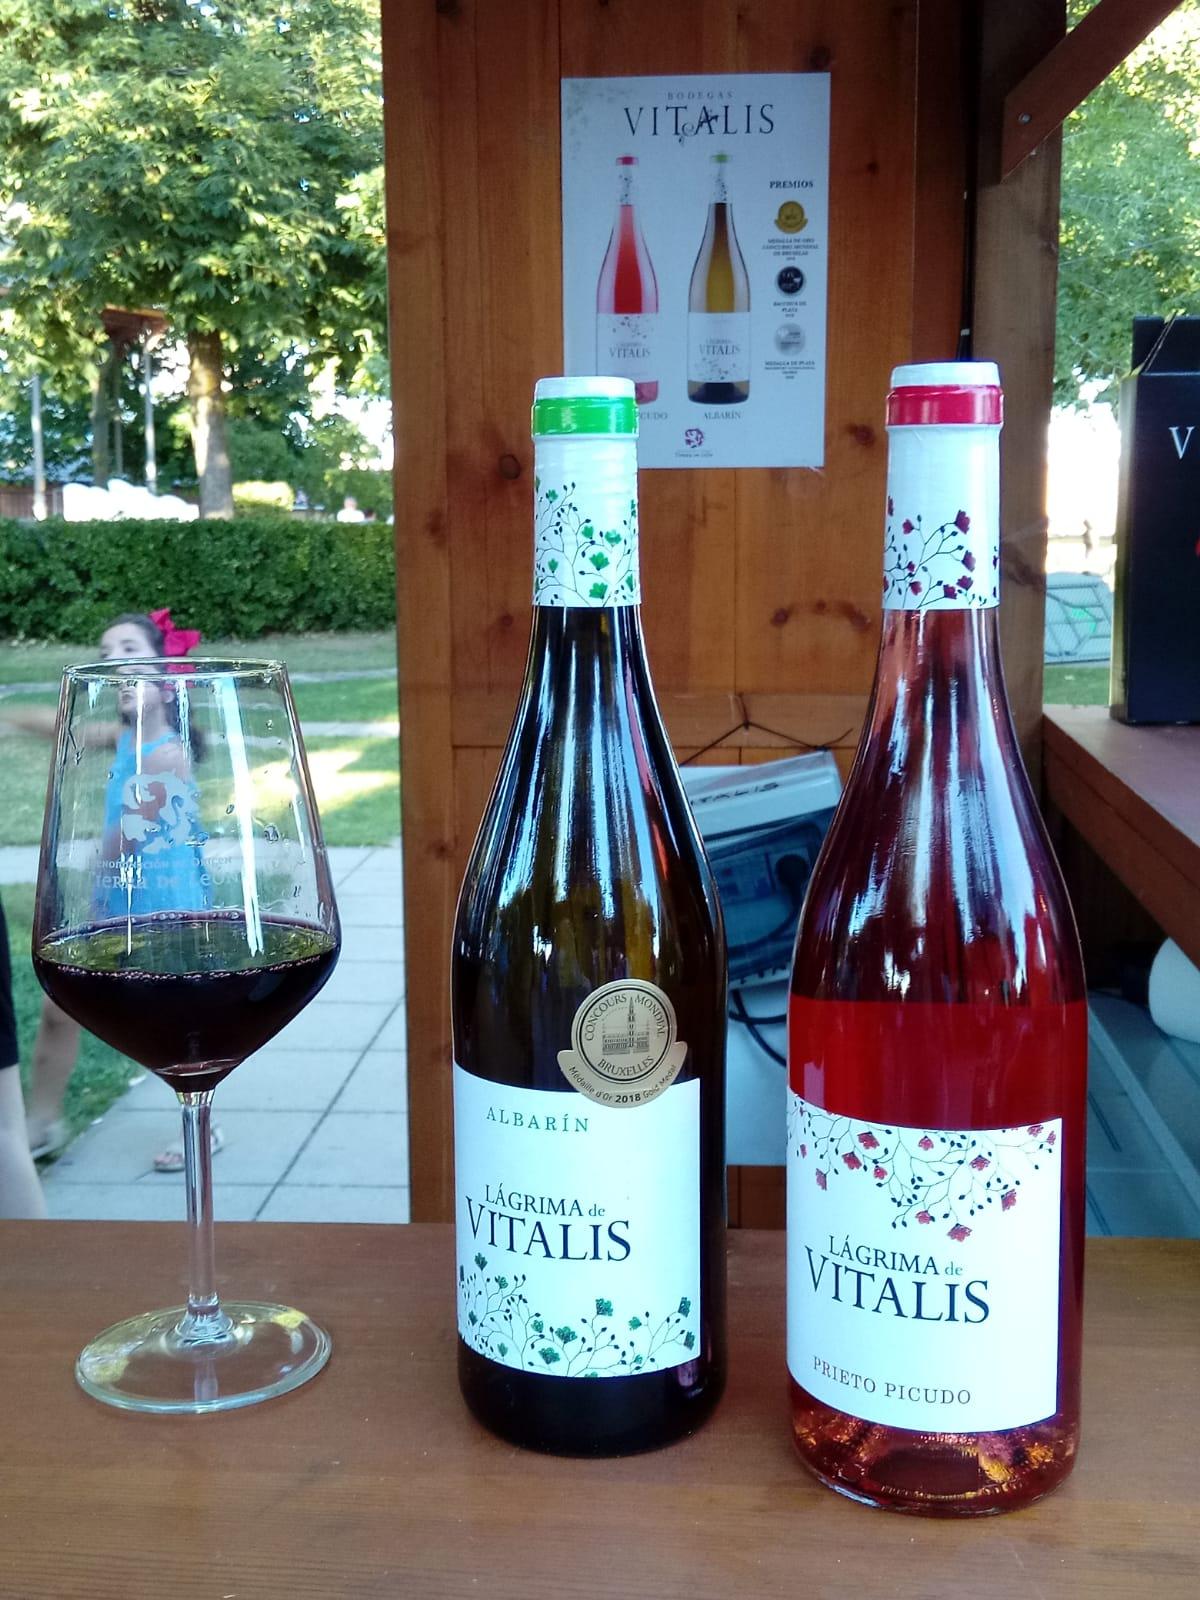 El vino reina en Valencia de Don Juan